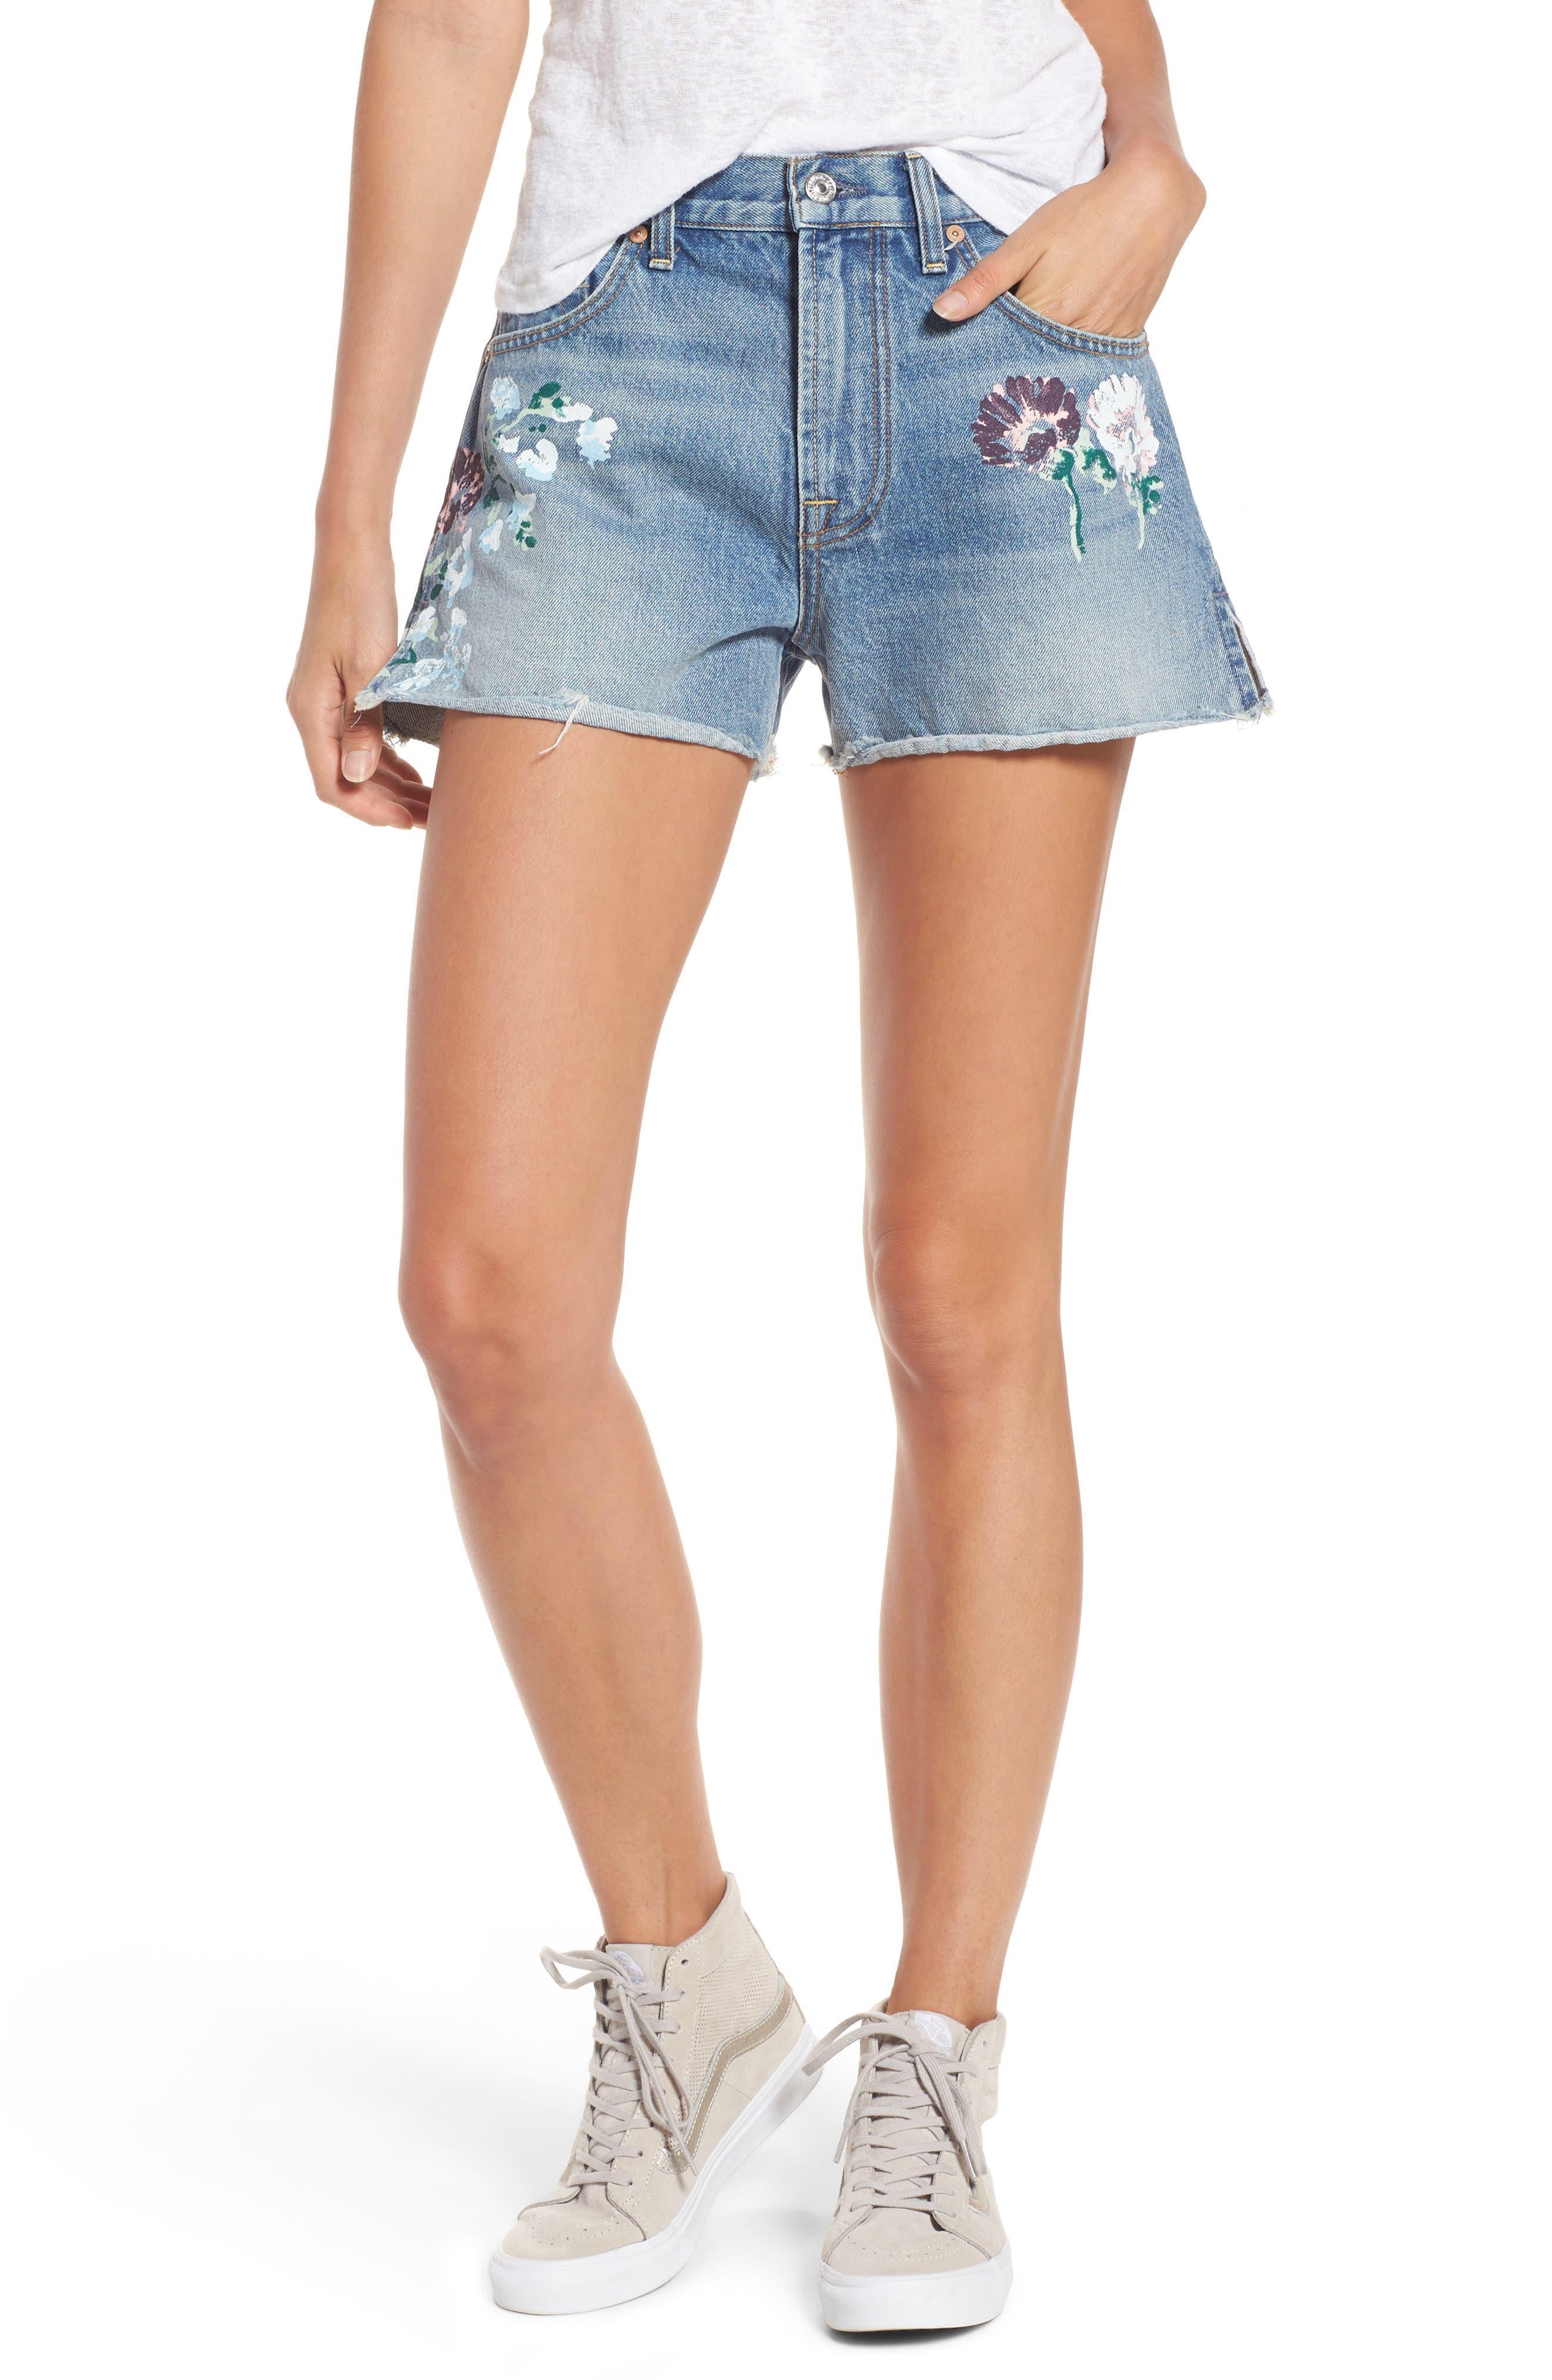 Handpainted Cutoff Denim Shorts,                         Main,                         color, VINTAGE WYTHE PAINTED FLORAL